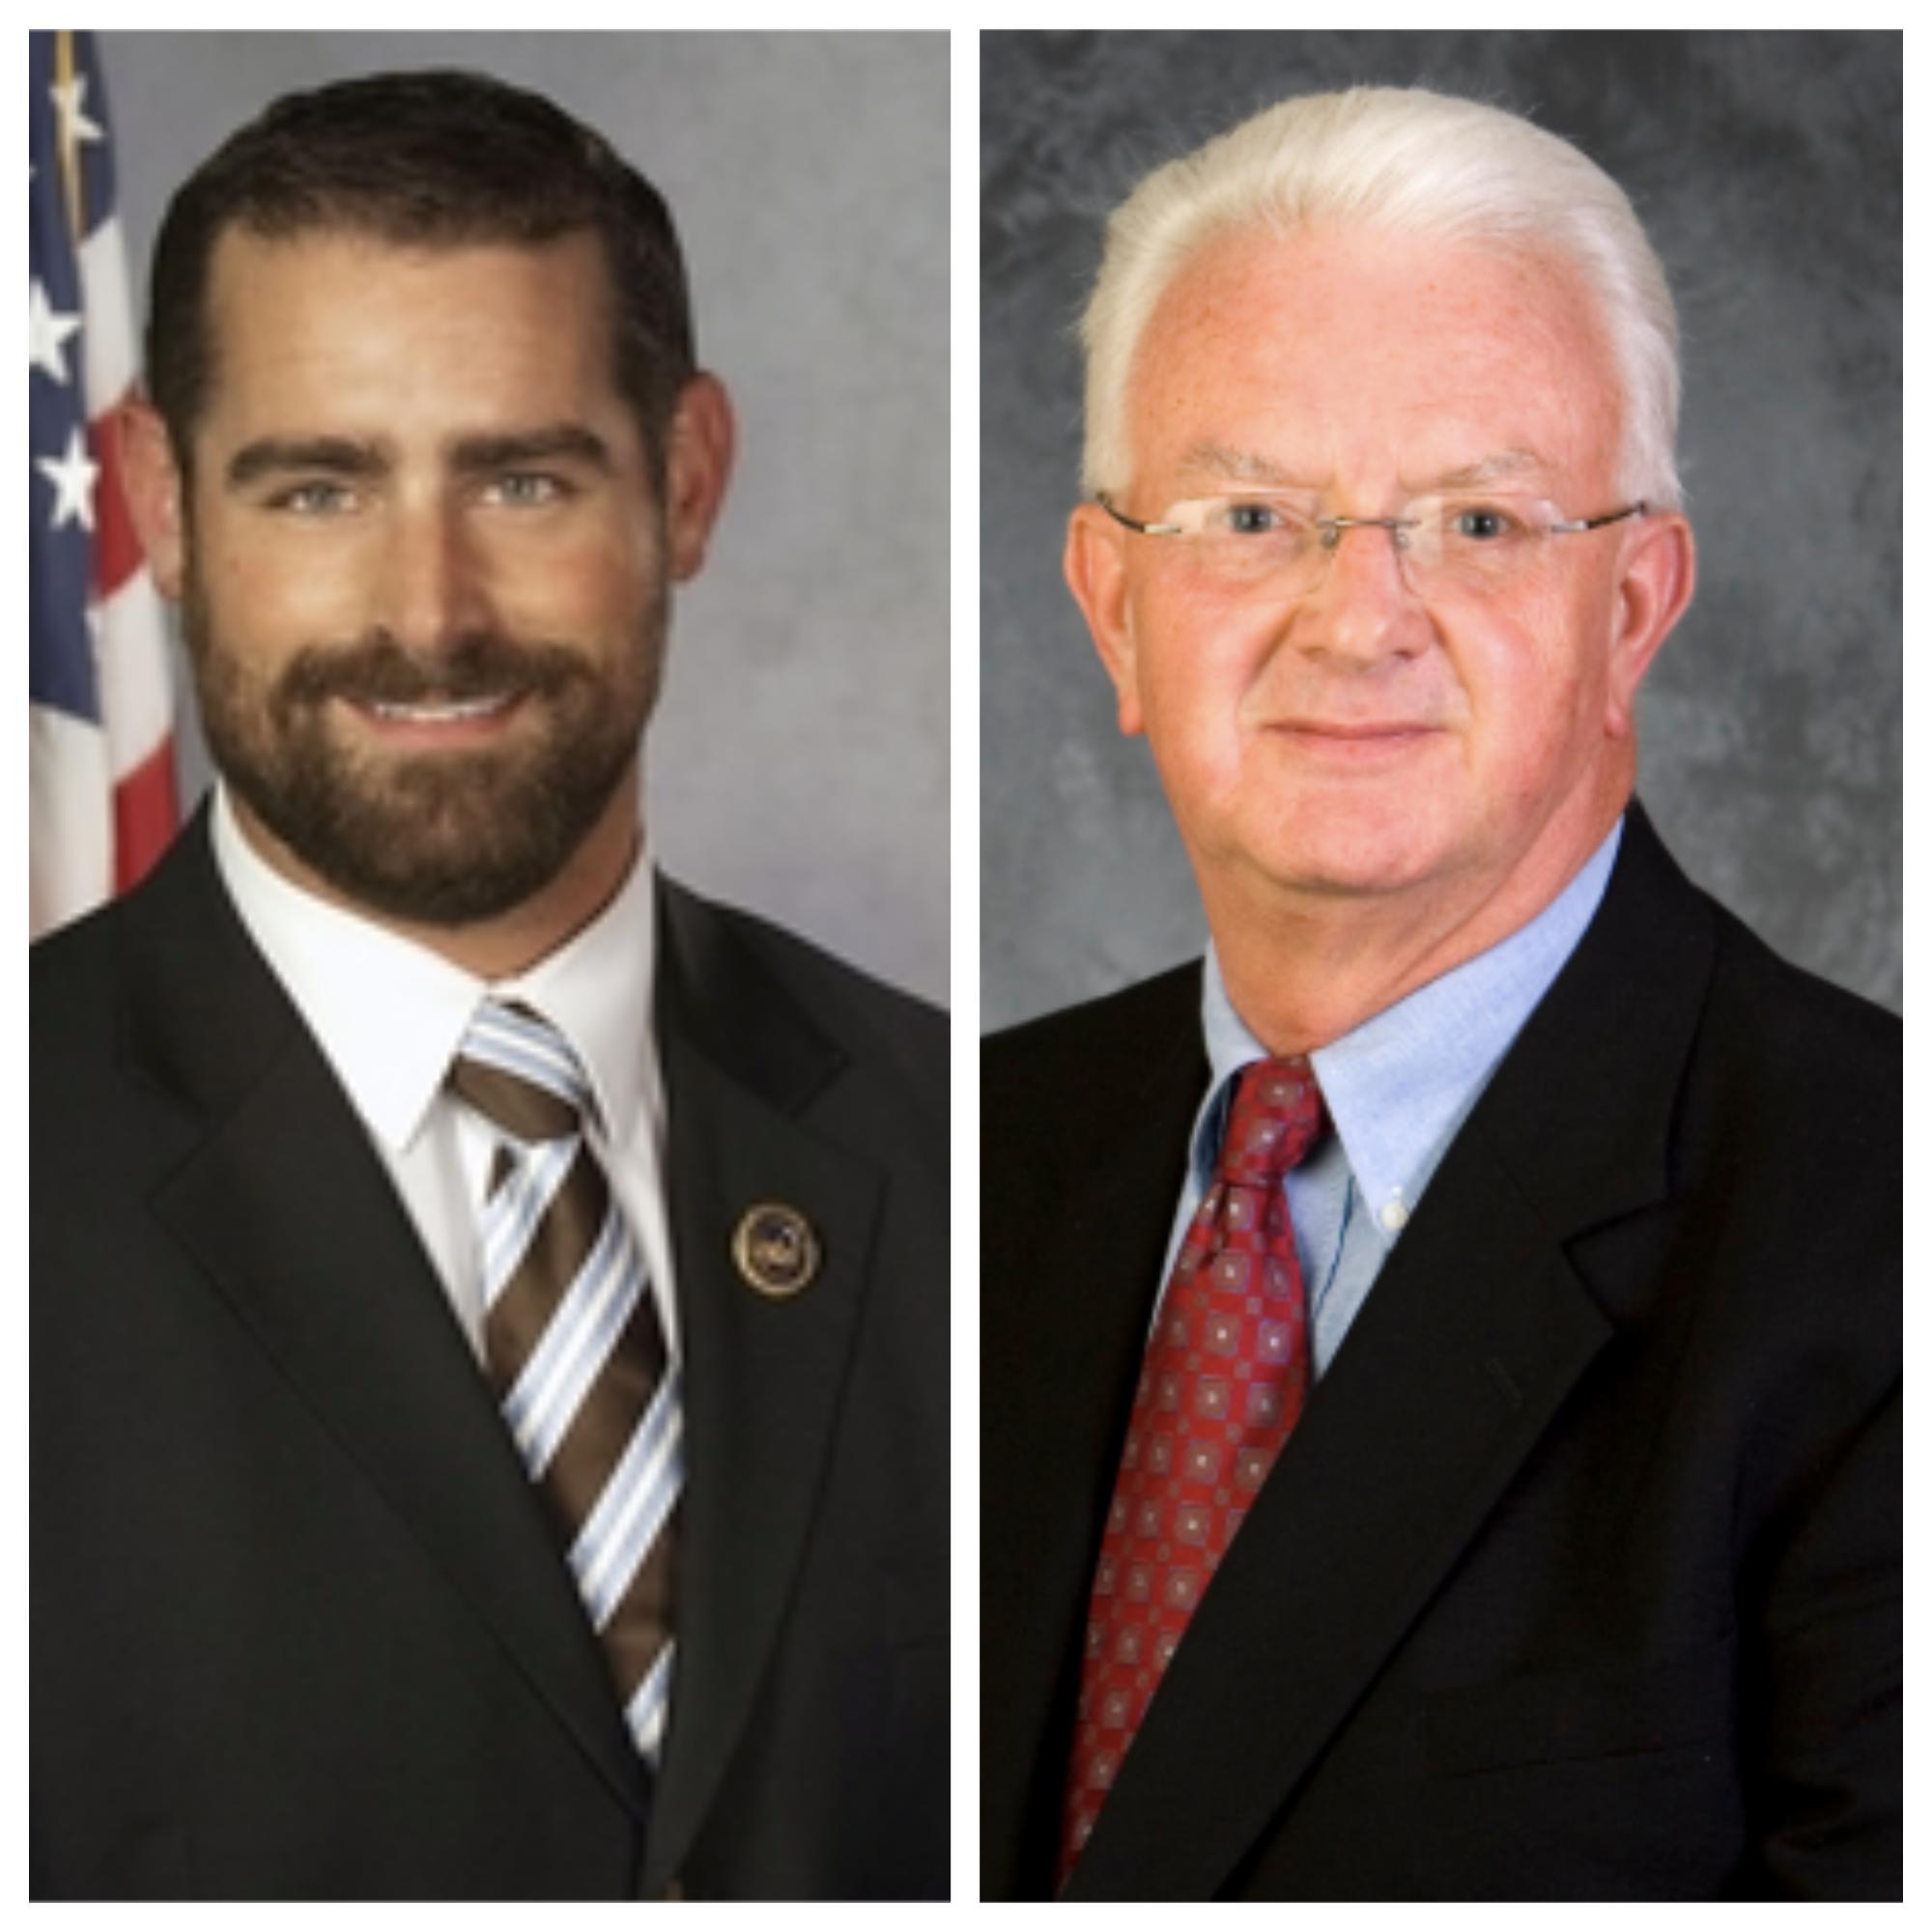 Lawmaker calls for censure of Philadelphia Democrat for bring 'shame' to Pa. House